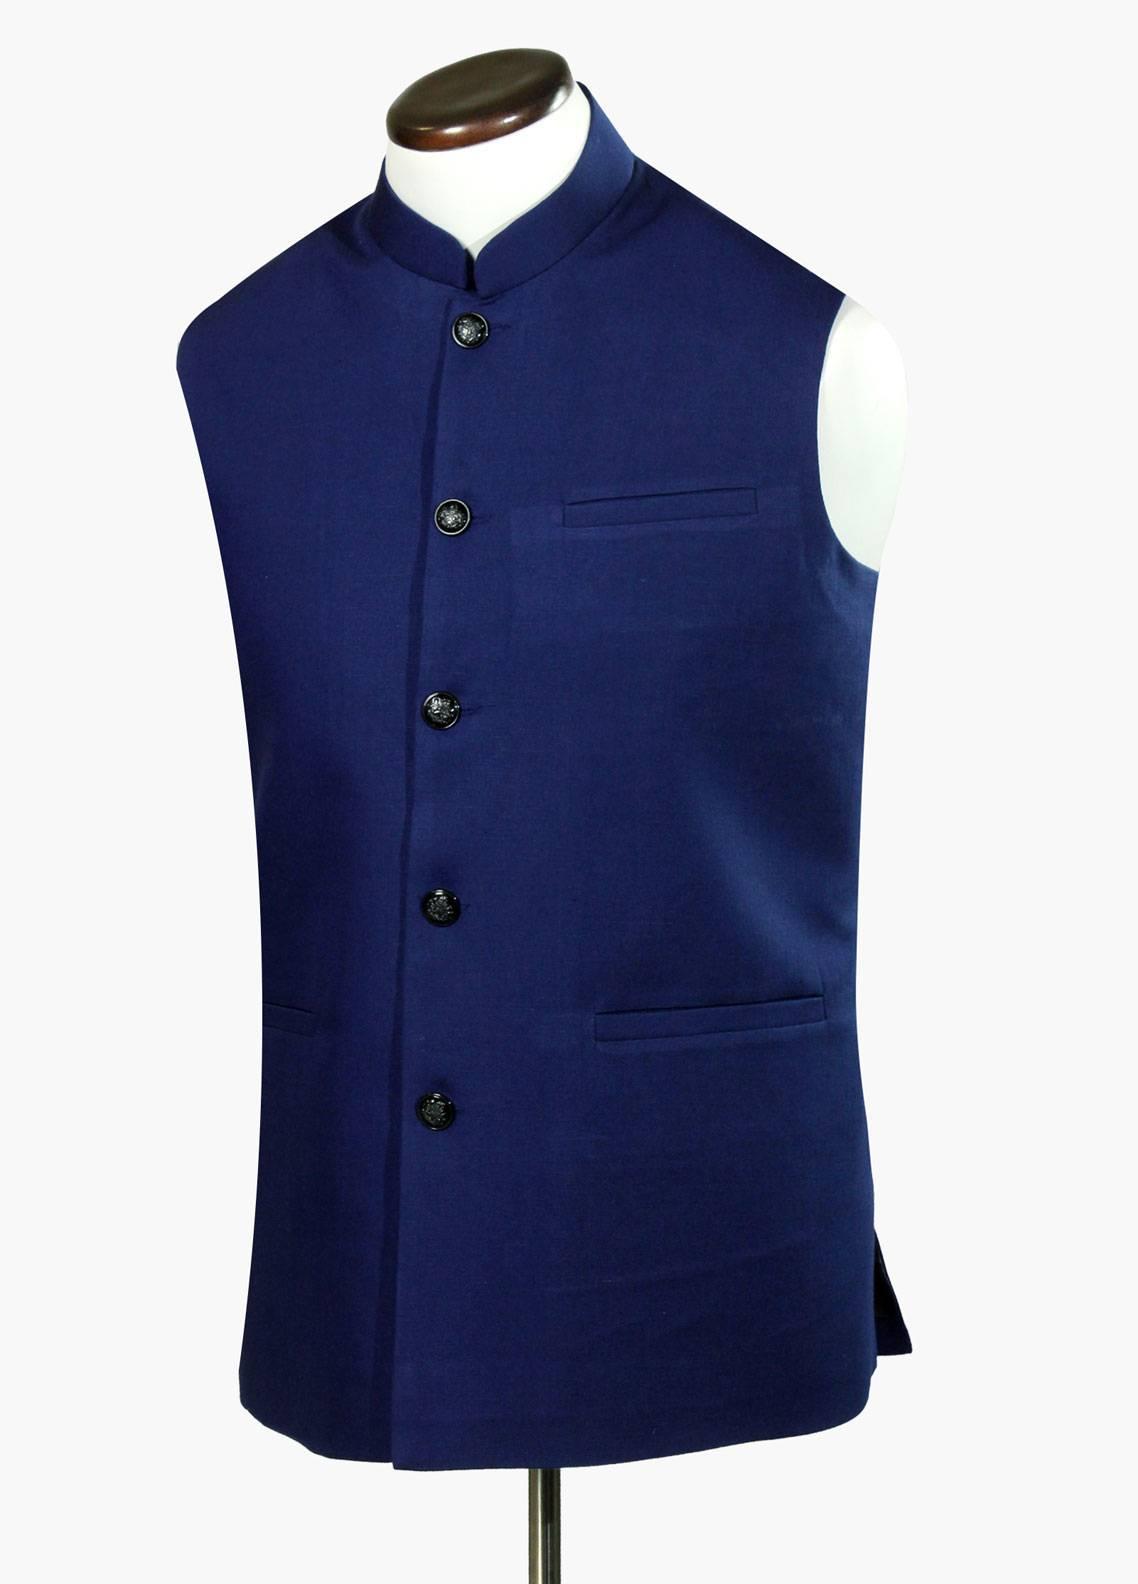 Brumano Linen Formal Waistcoat for Men - Royal Blue BRM-745